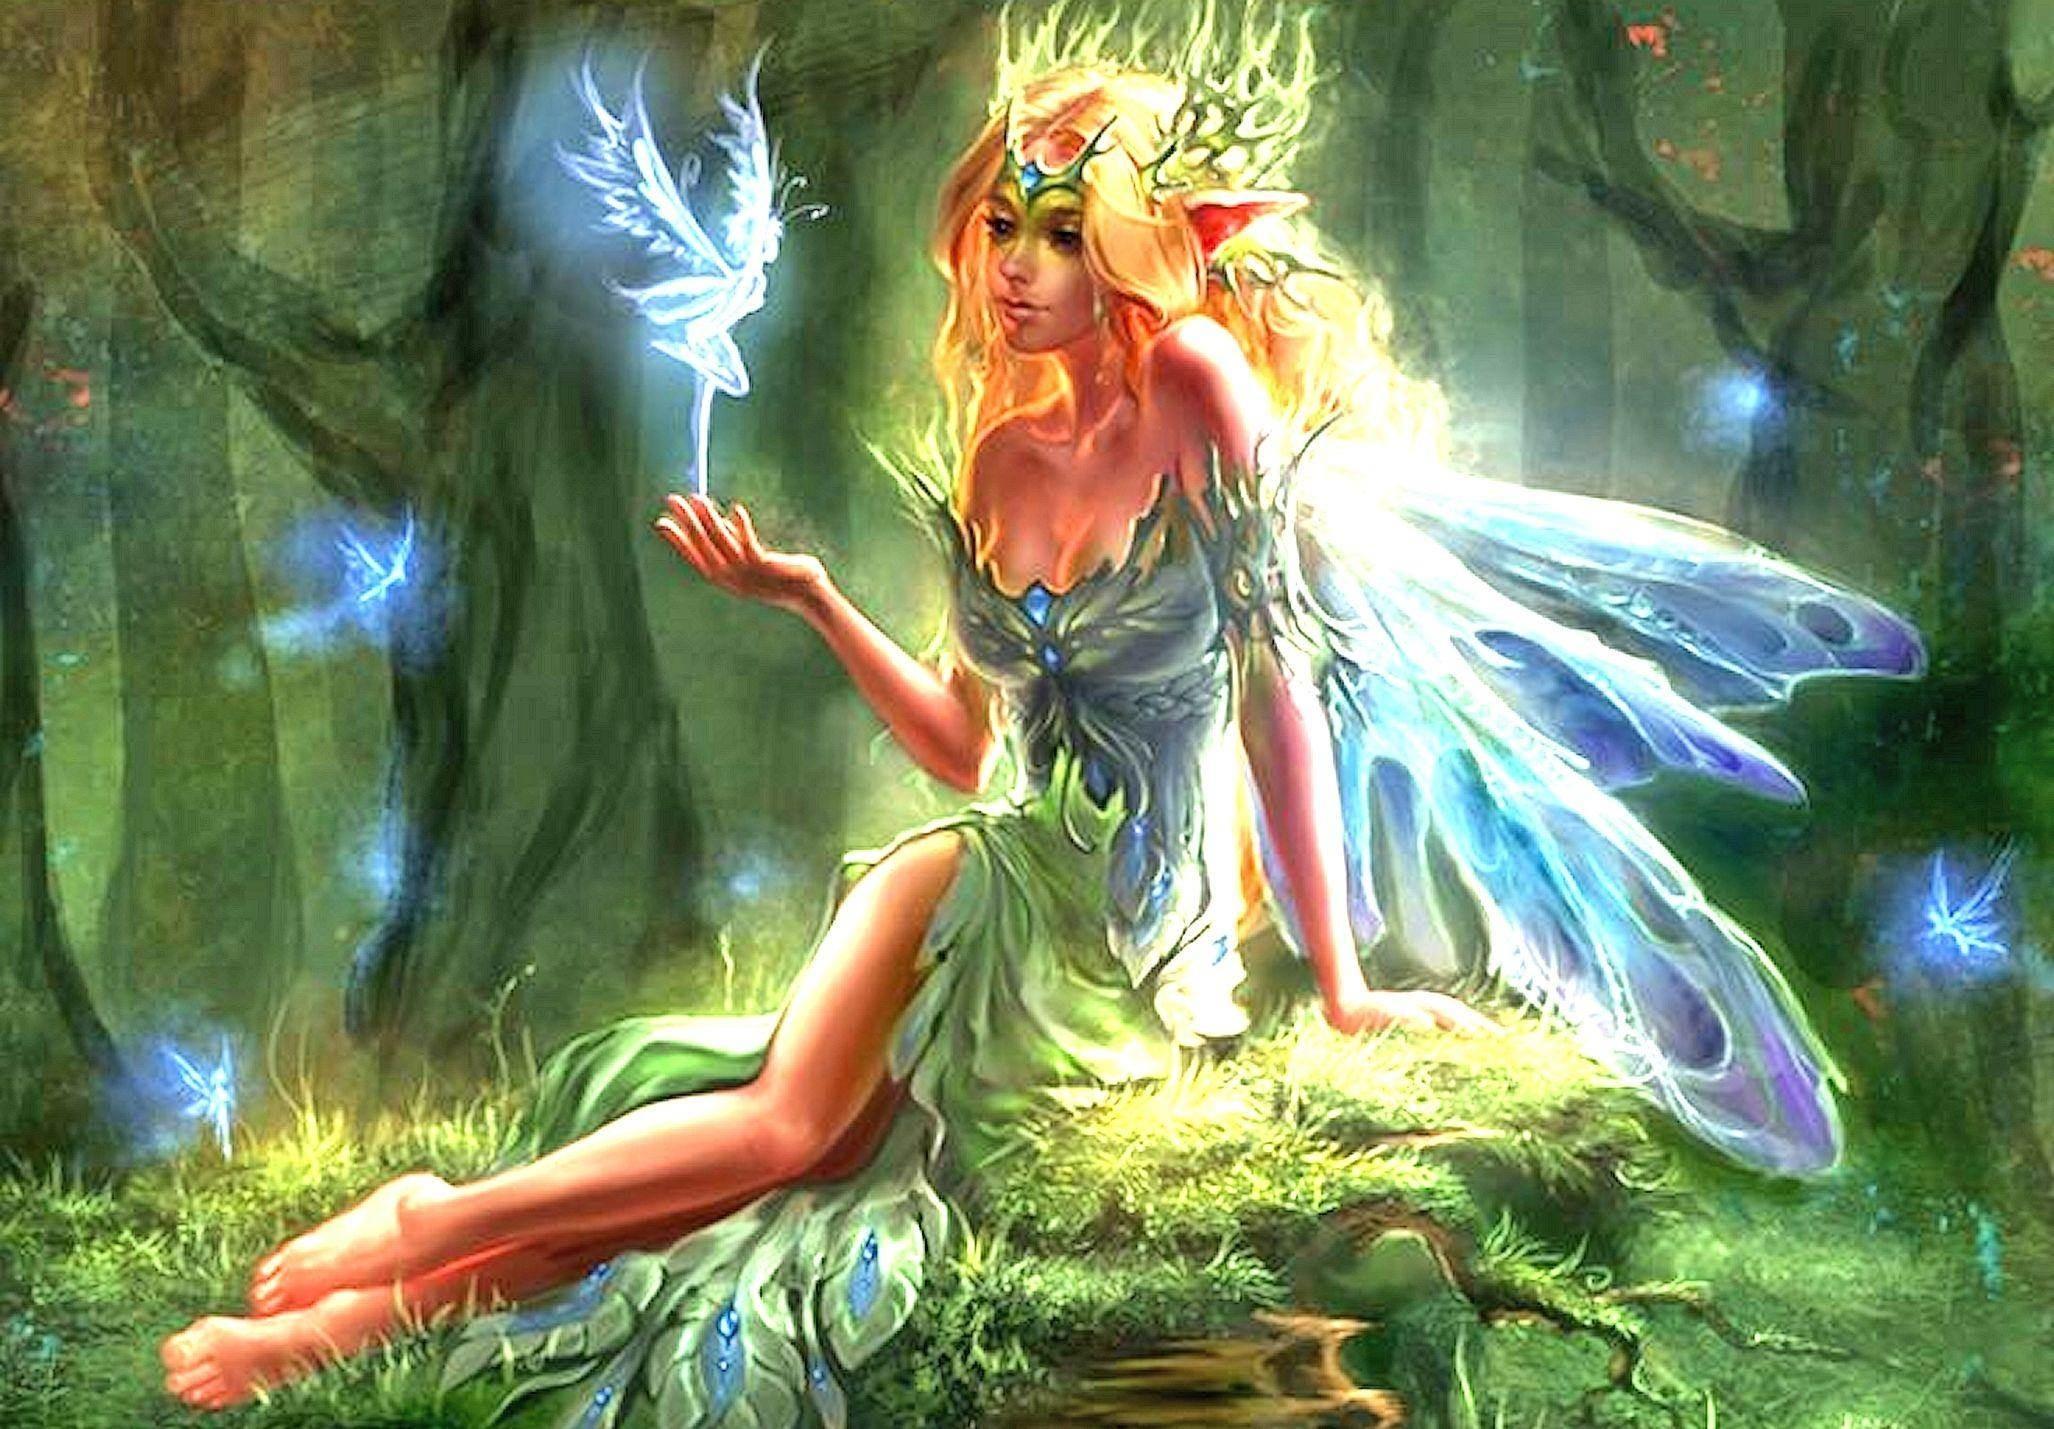 Cute Cartoon Angel Wallpaper Fantasy Fairies Wallpapers 62 Images